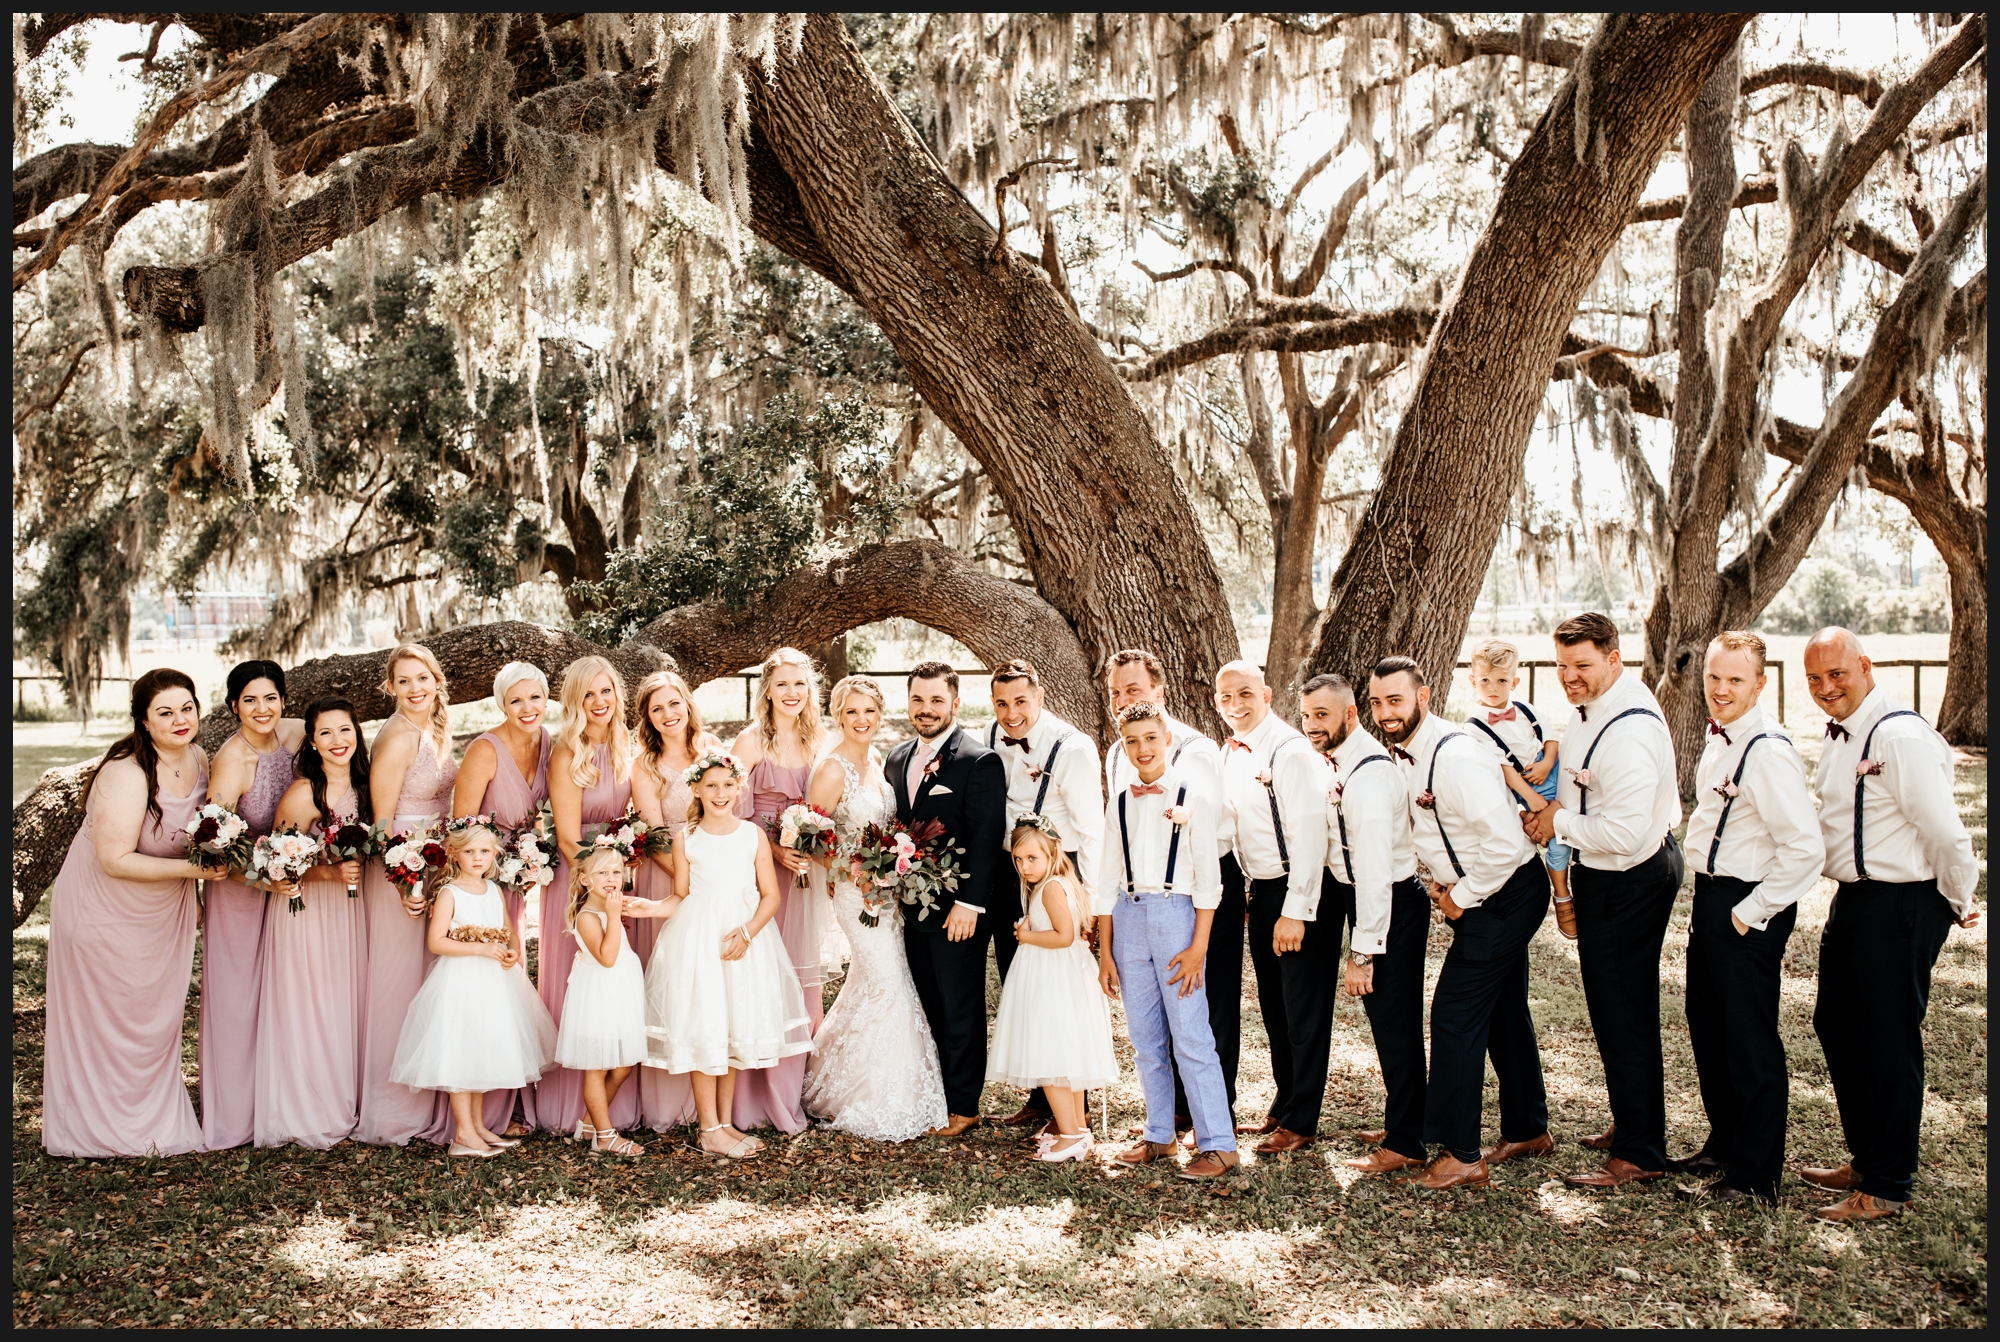 Orlando-Wedding-Photographer-destination-wedding-photographer-florida-wedding-photographer-hawaii-wedding-photographer_0586.jpg